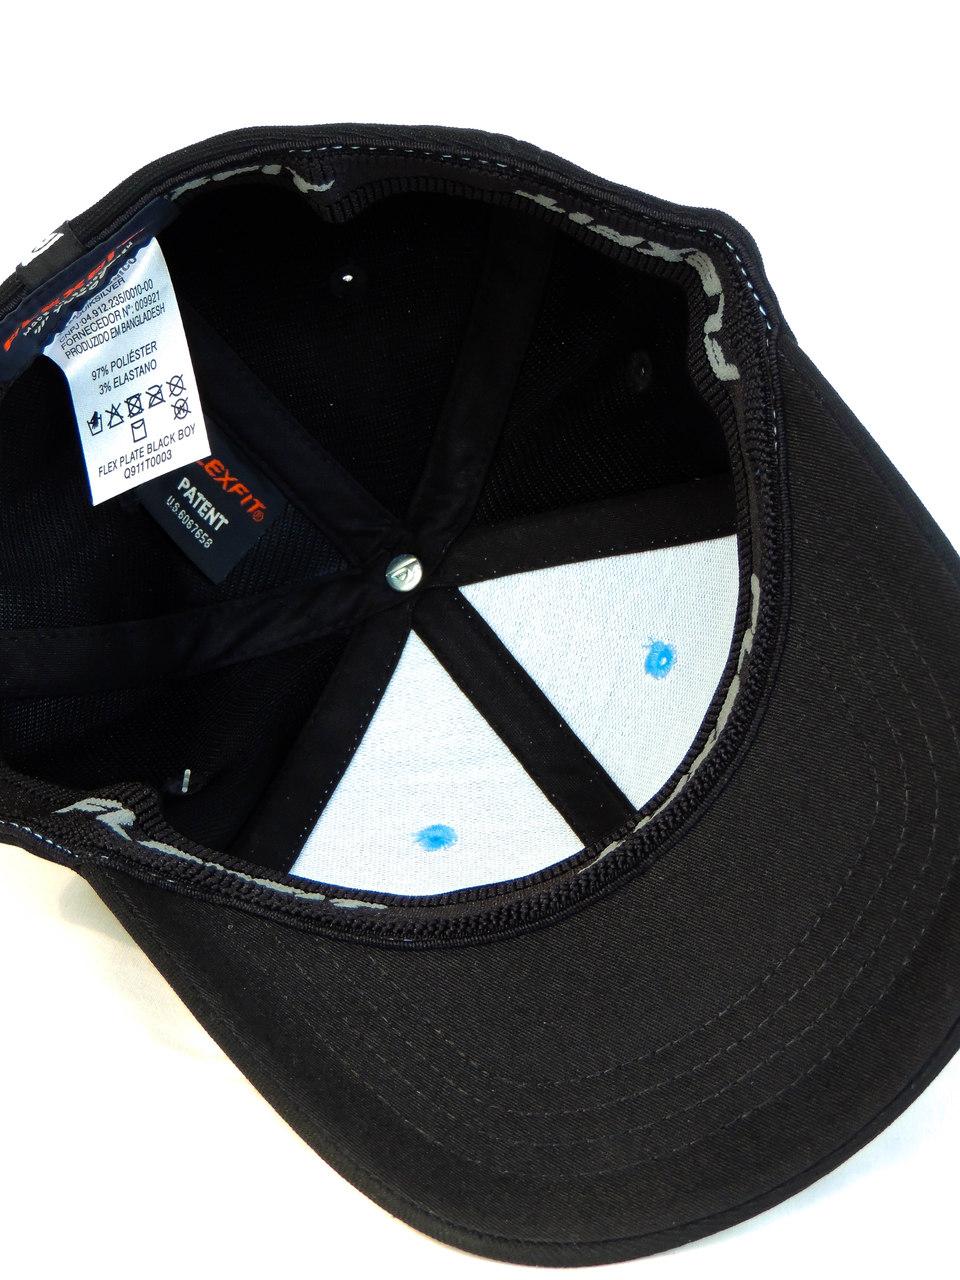 Boné Quiksilver Juvenil Flexfit Plate Azul e Preto